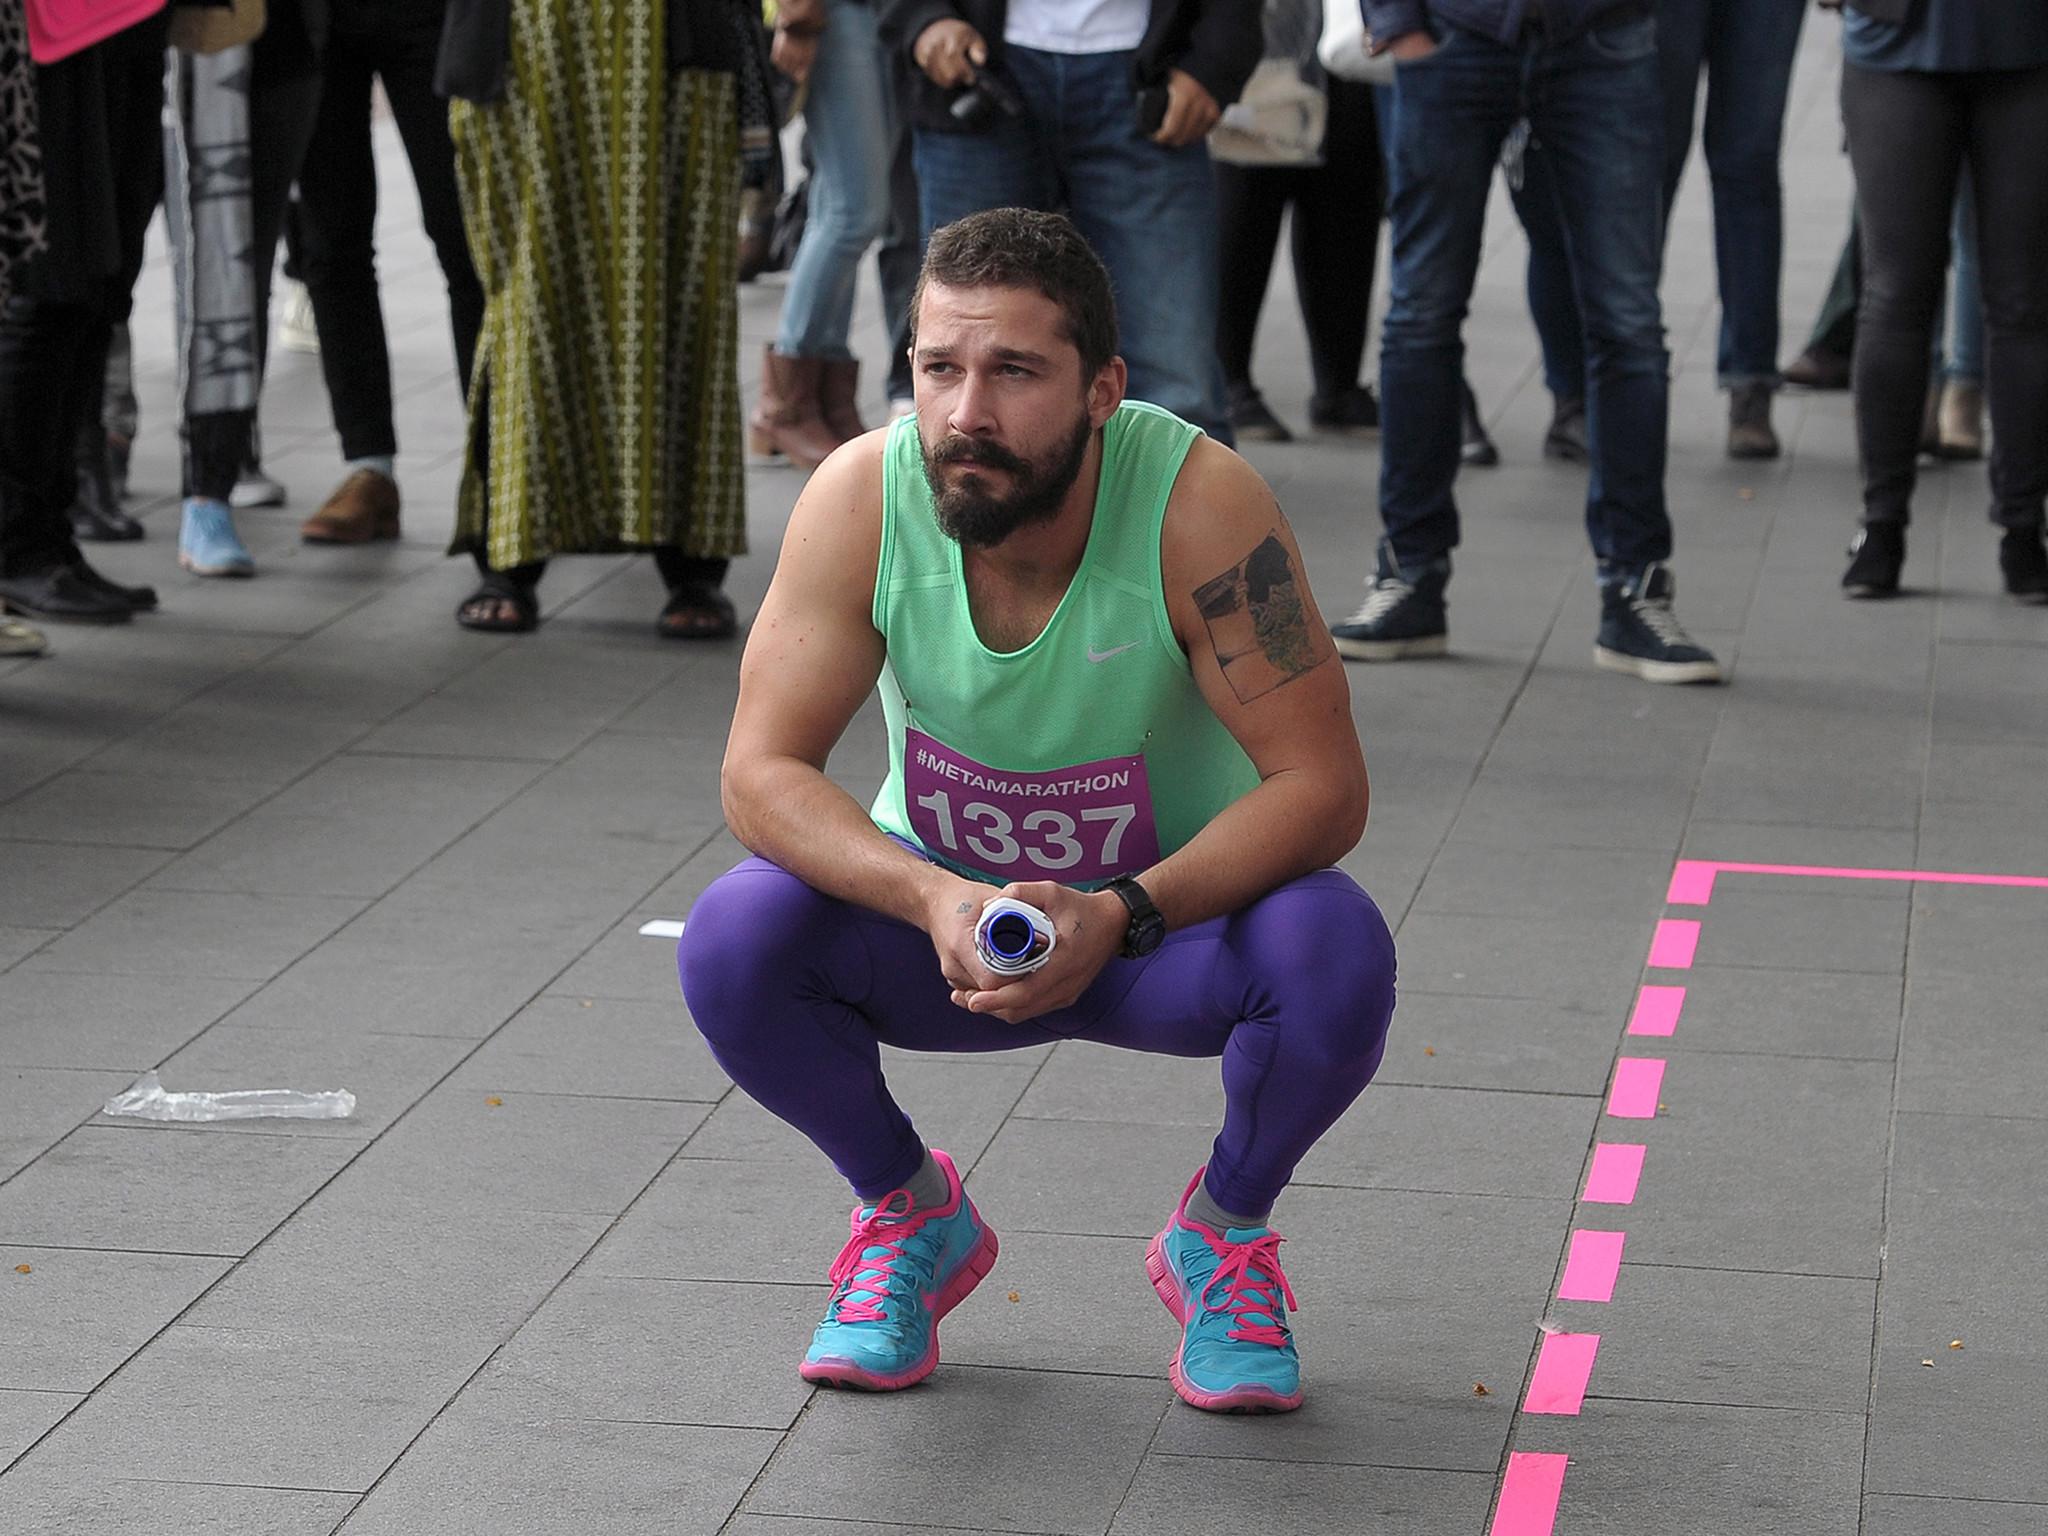 Shia LaBeouf runs around Amsterdam museum 144 times for bizarre art  '#metamarathon'   The Independent